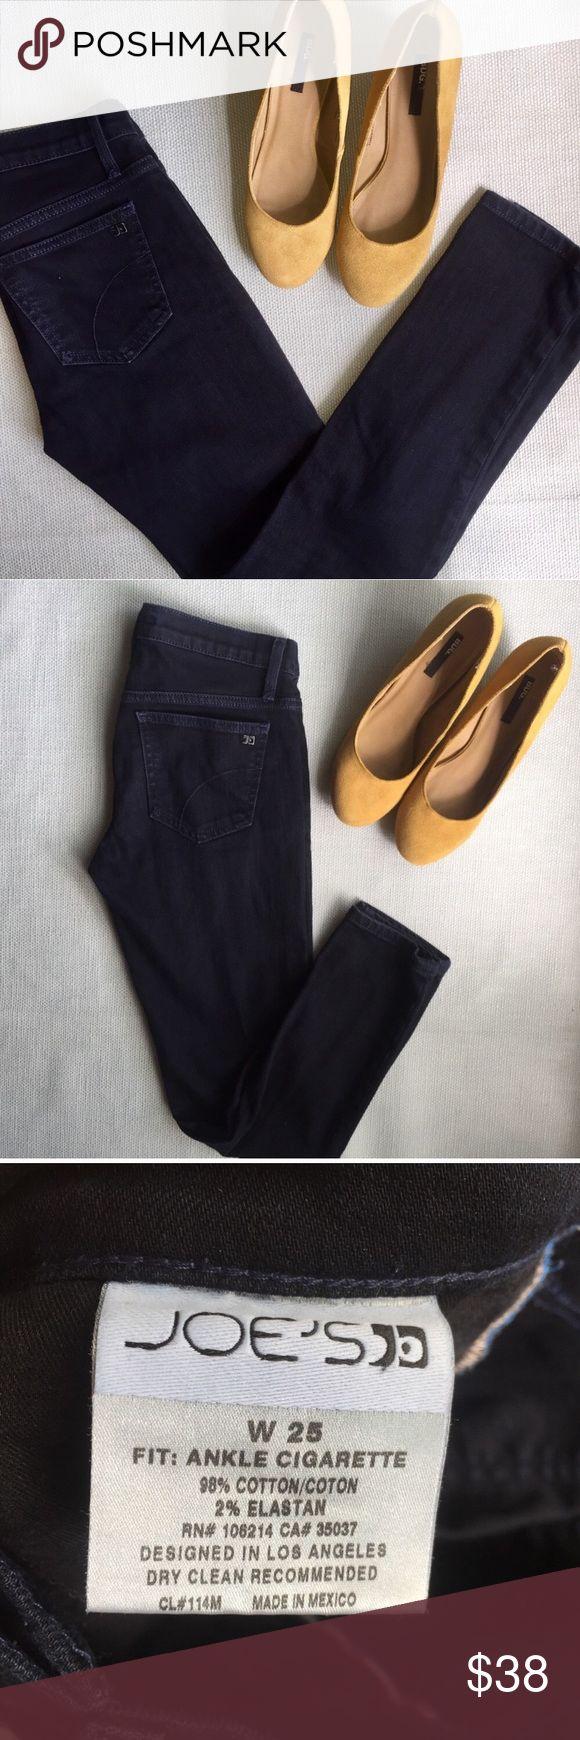 "Joe's Jeans Cigarette Ankle Fit - 25 Very dark blue wash, ALMOST black but not quite. Excellent condition. 25w tag size. MEASUREMENTS: 28"" waist 8"" front rise 33"" hip 27.25"" inseam Joe's Jeans Jeans Ankle & Cropped"